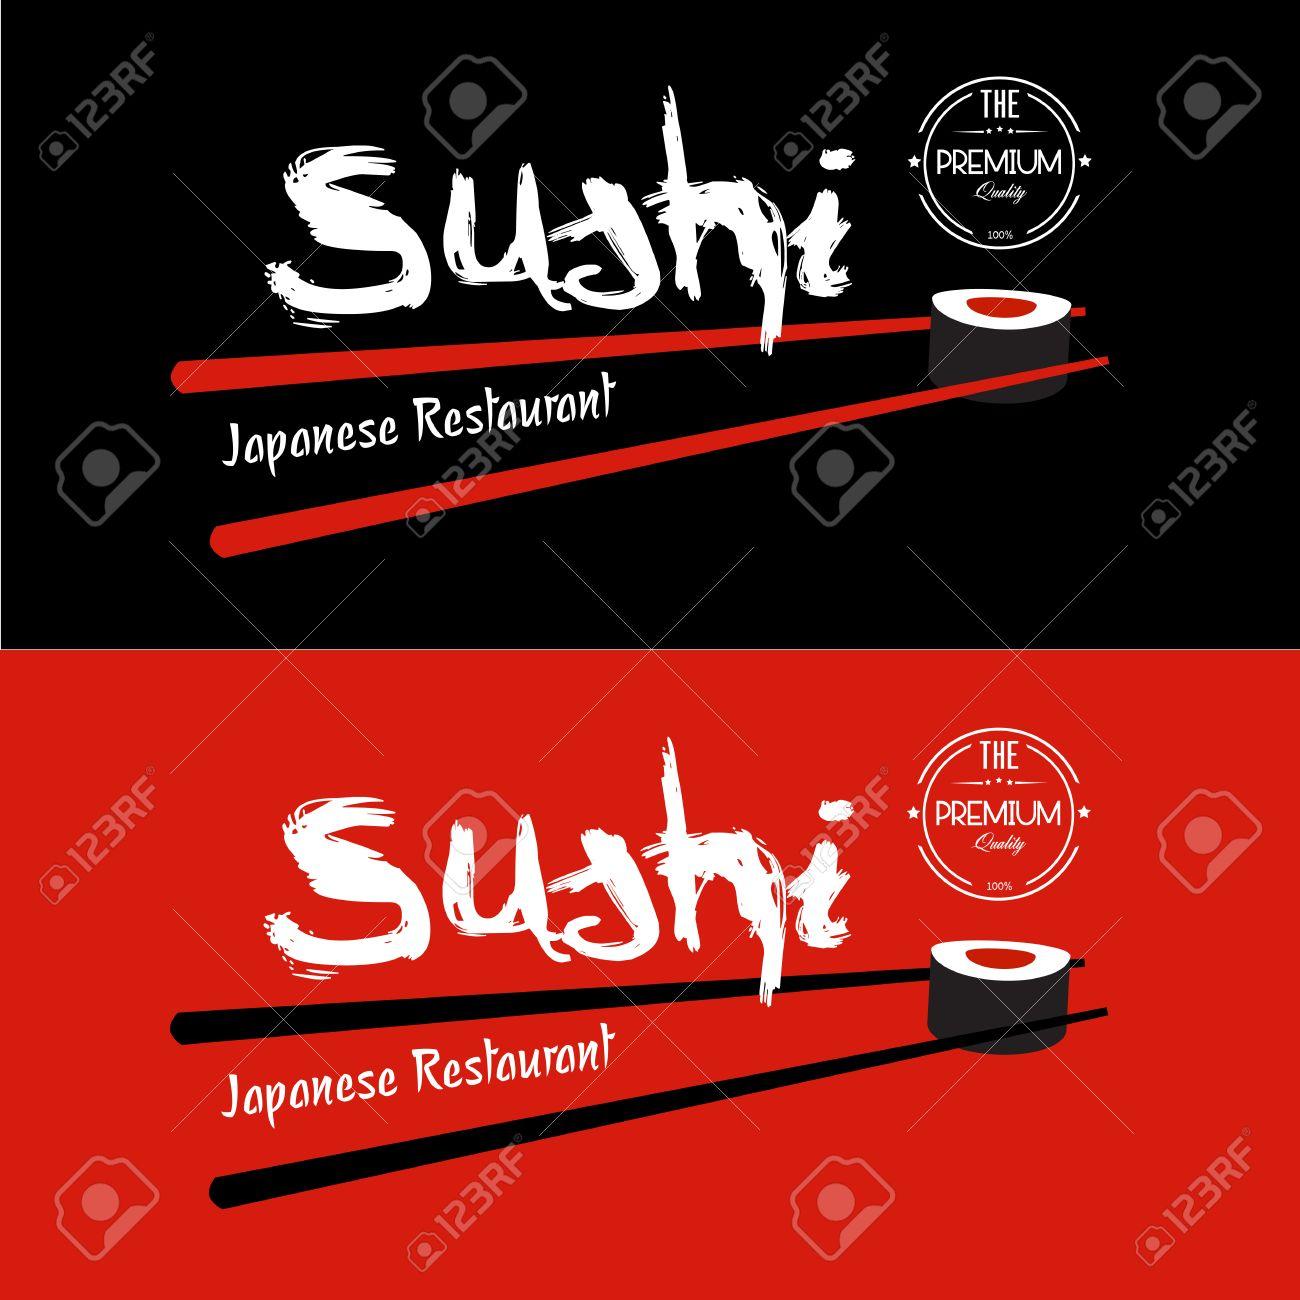 Sushi Restaurant Design sushi japanese restaurant design template royalty free cliparts